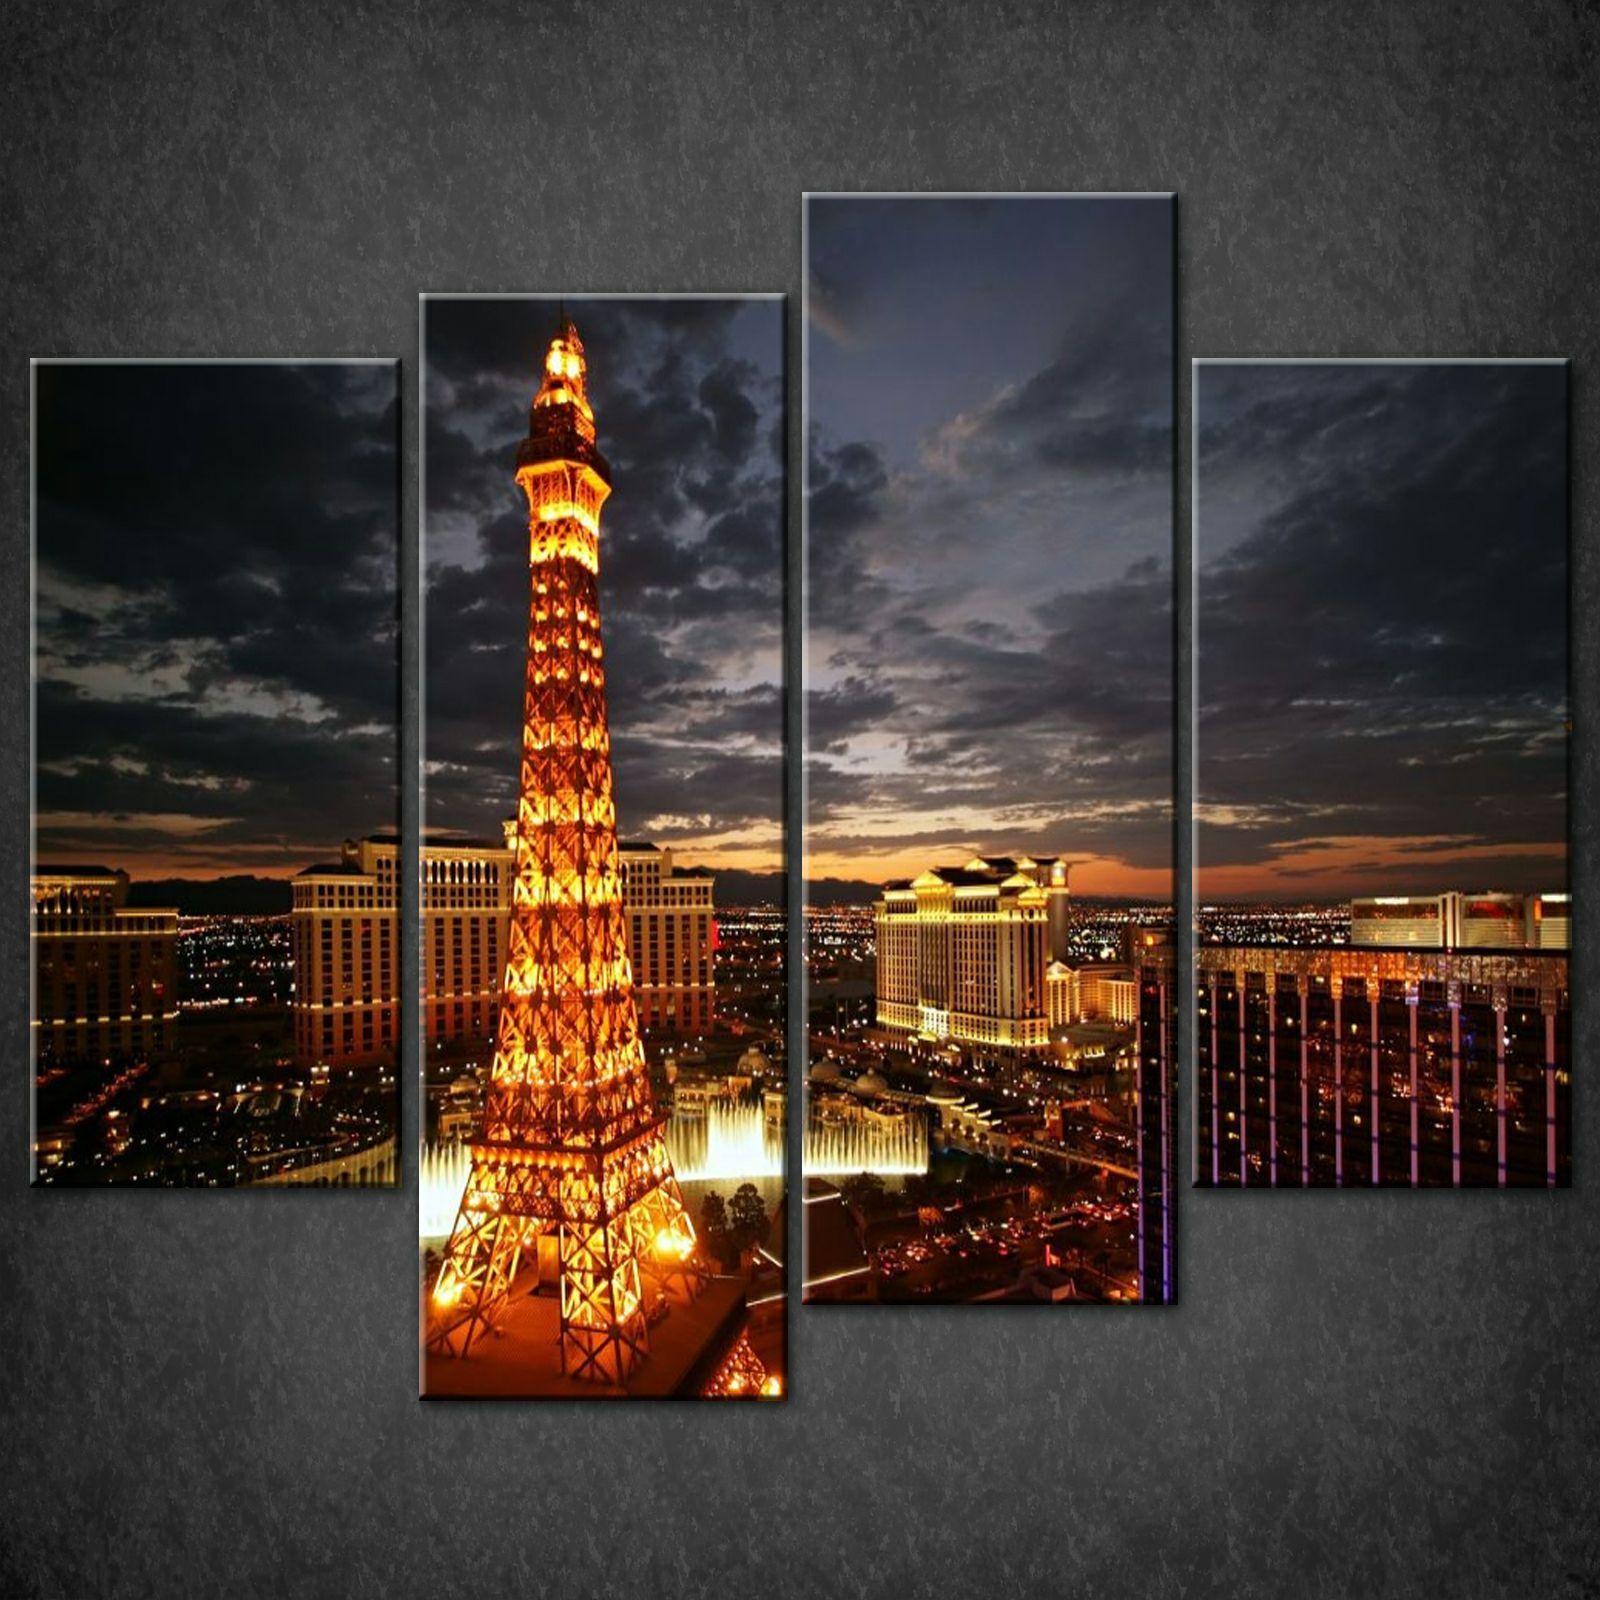 Las Vegas Posters & Wall Murals